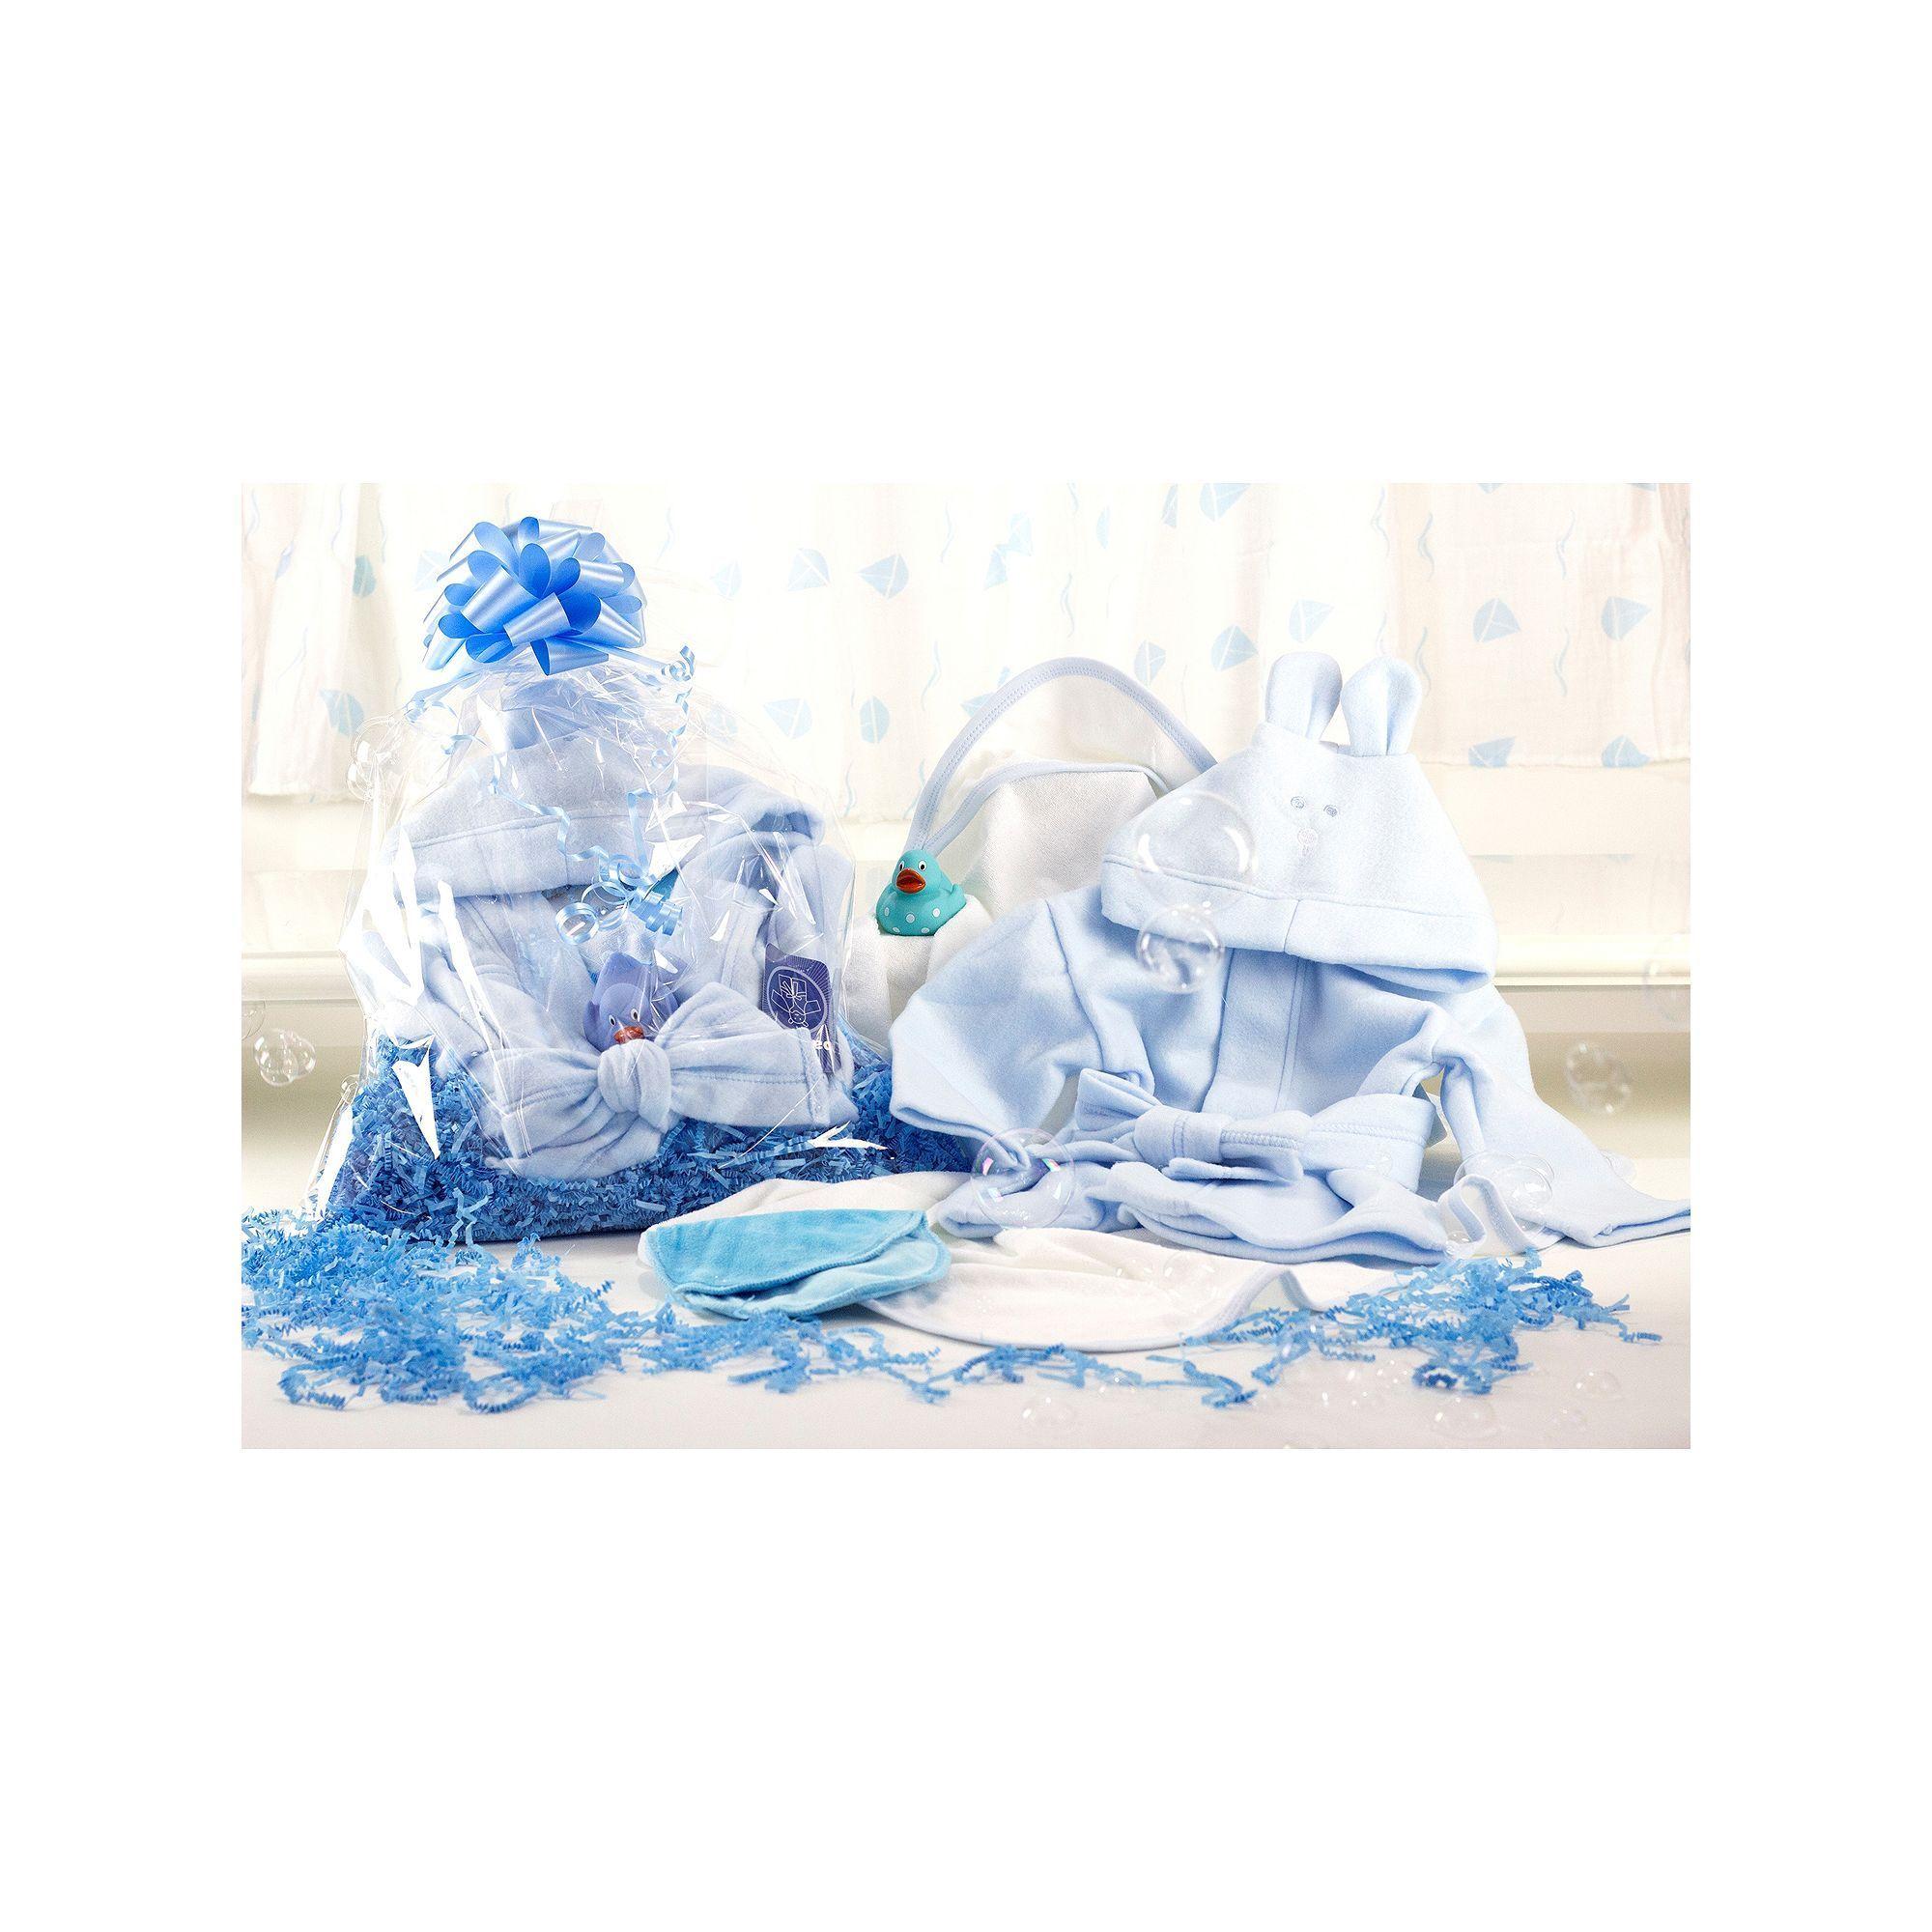 3 Stories Trading Co. Fun & Snuggles Bath Gift Set, Blue   Pinterest ...